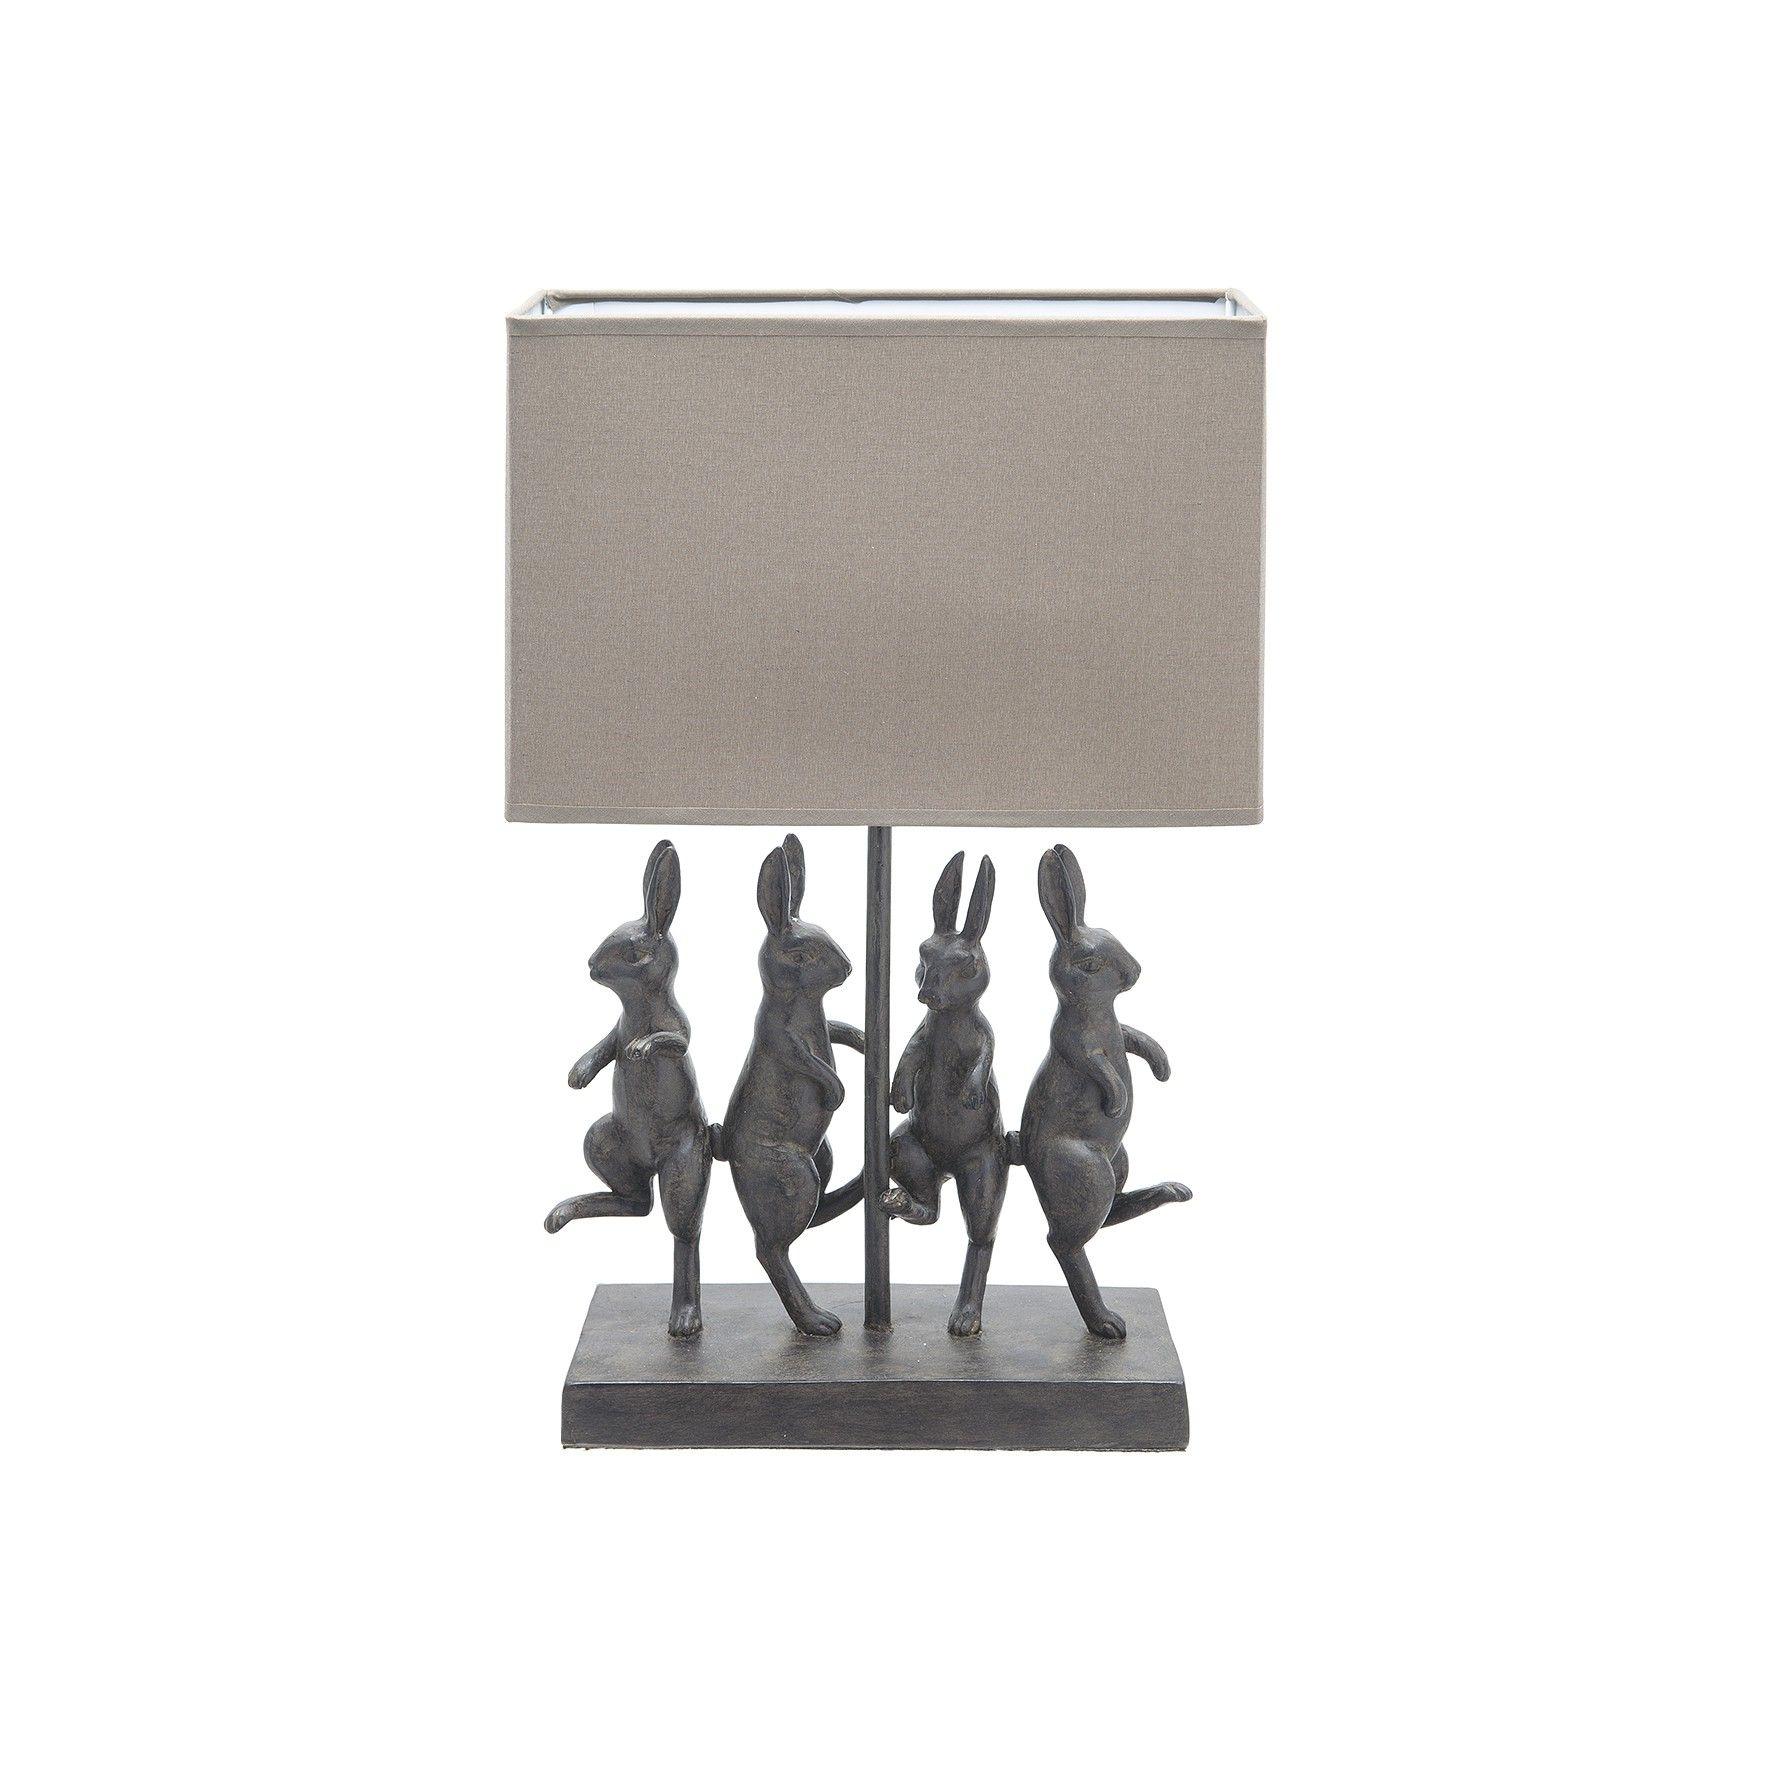 RABBIT table lamp   France - Home Ideas   Pinterest